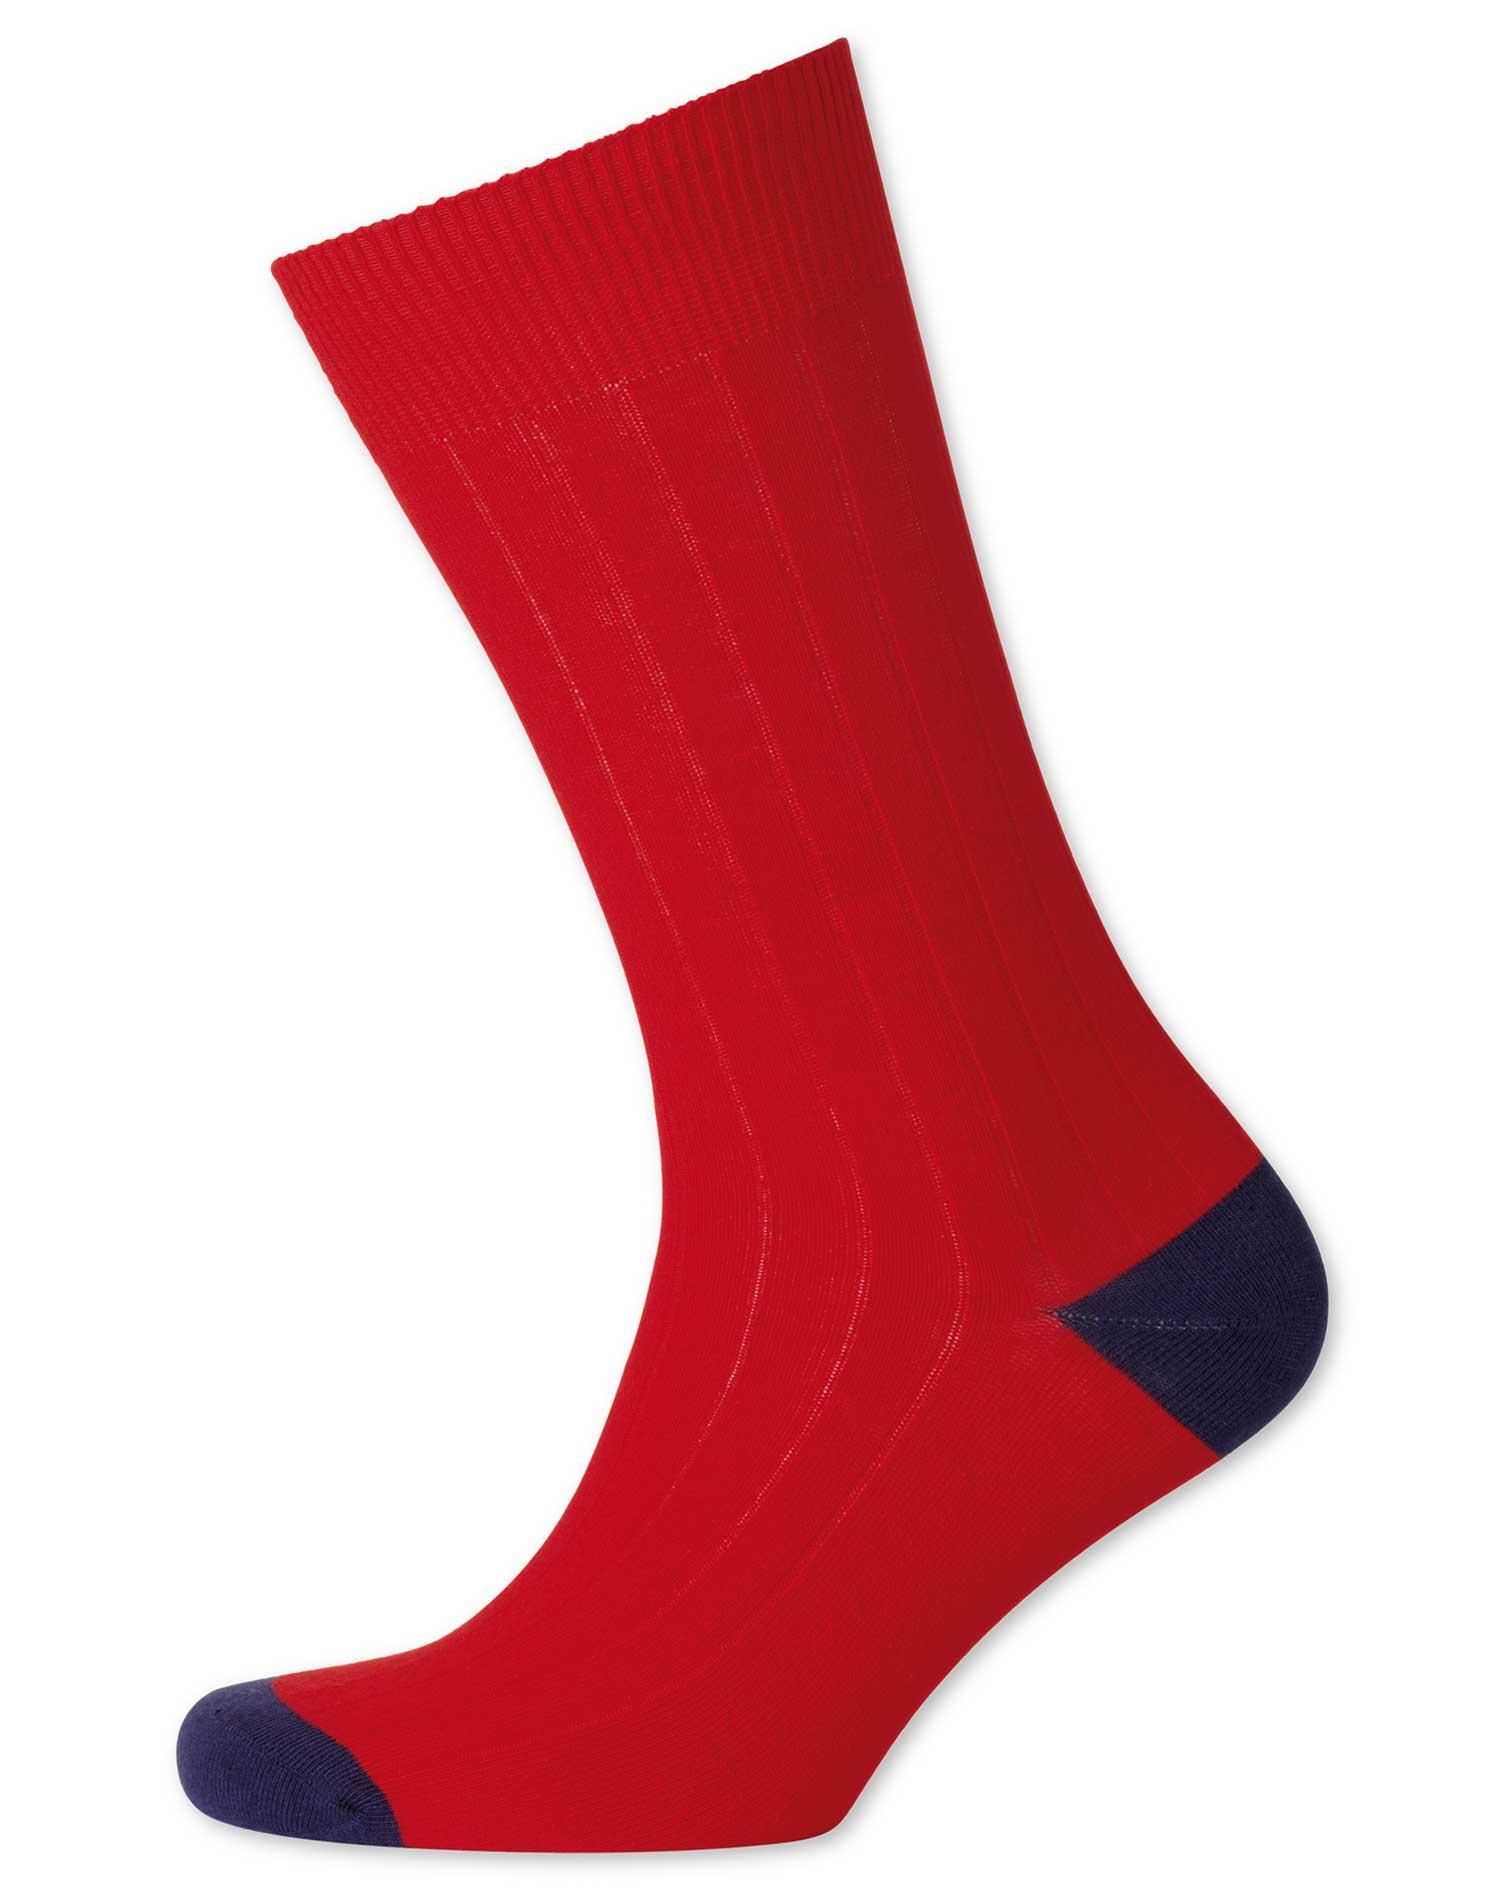 Red Ribbed Socks Size Medium by Charles Tyrwhitt